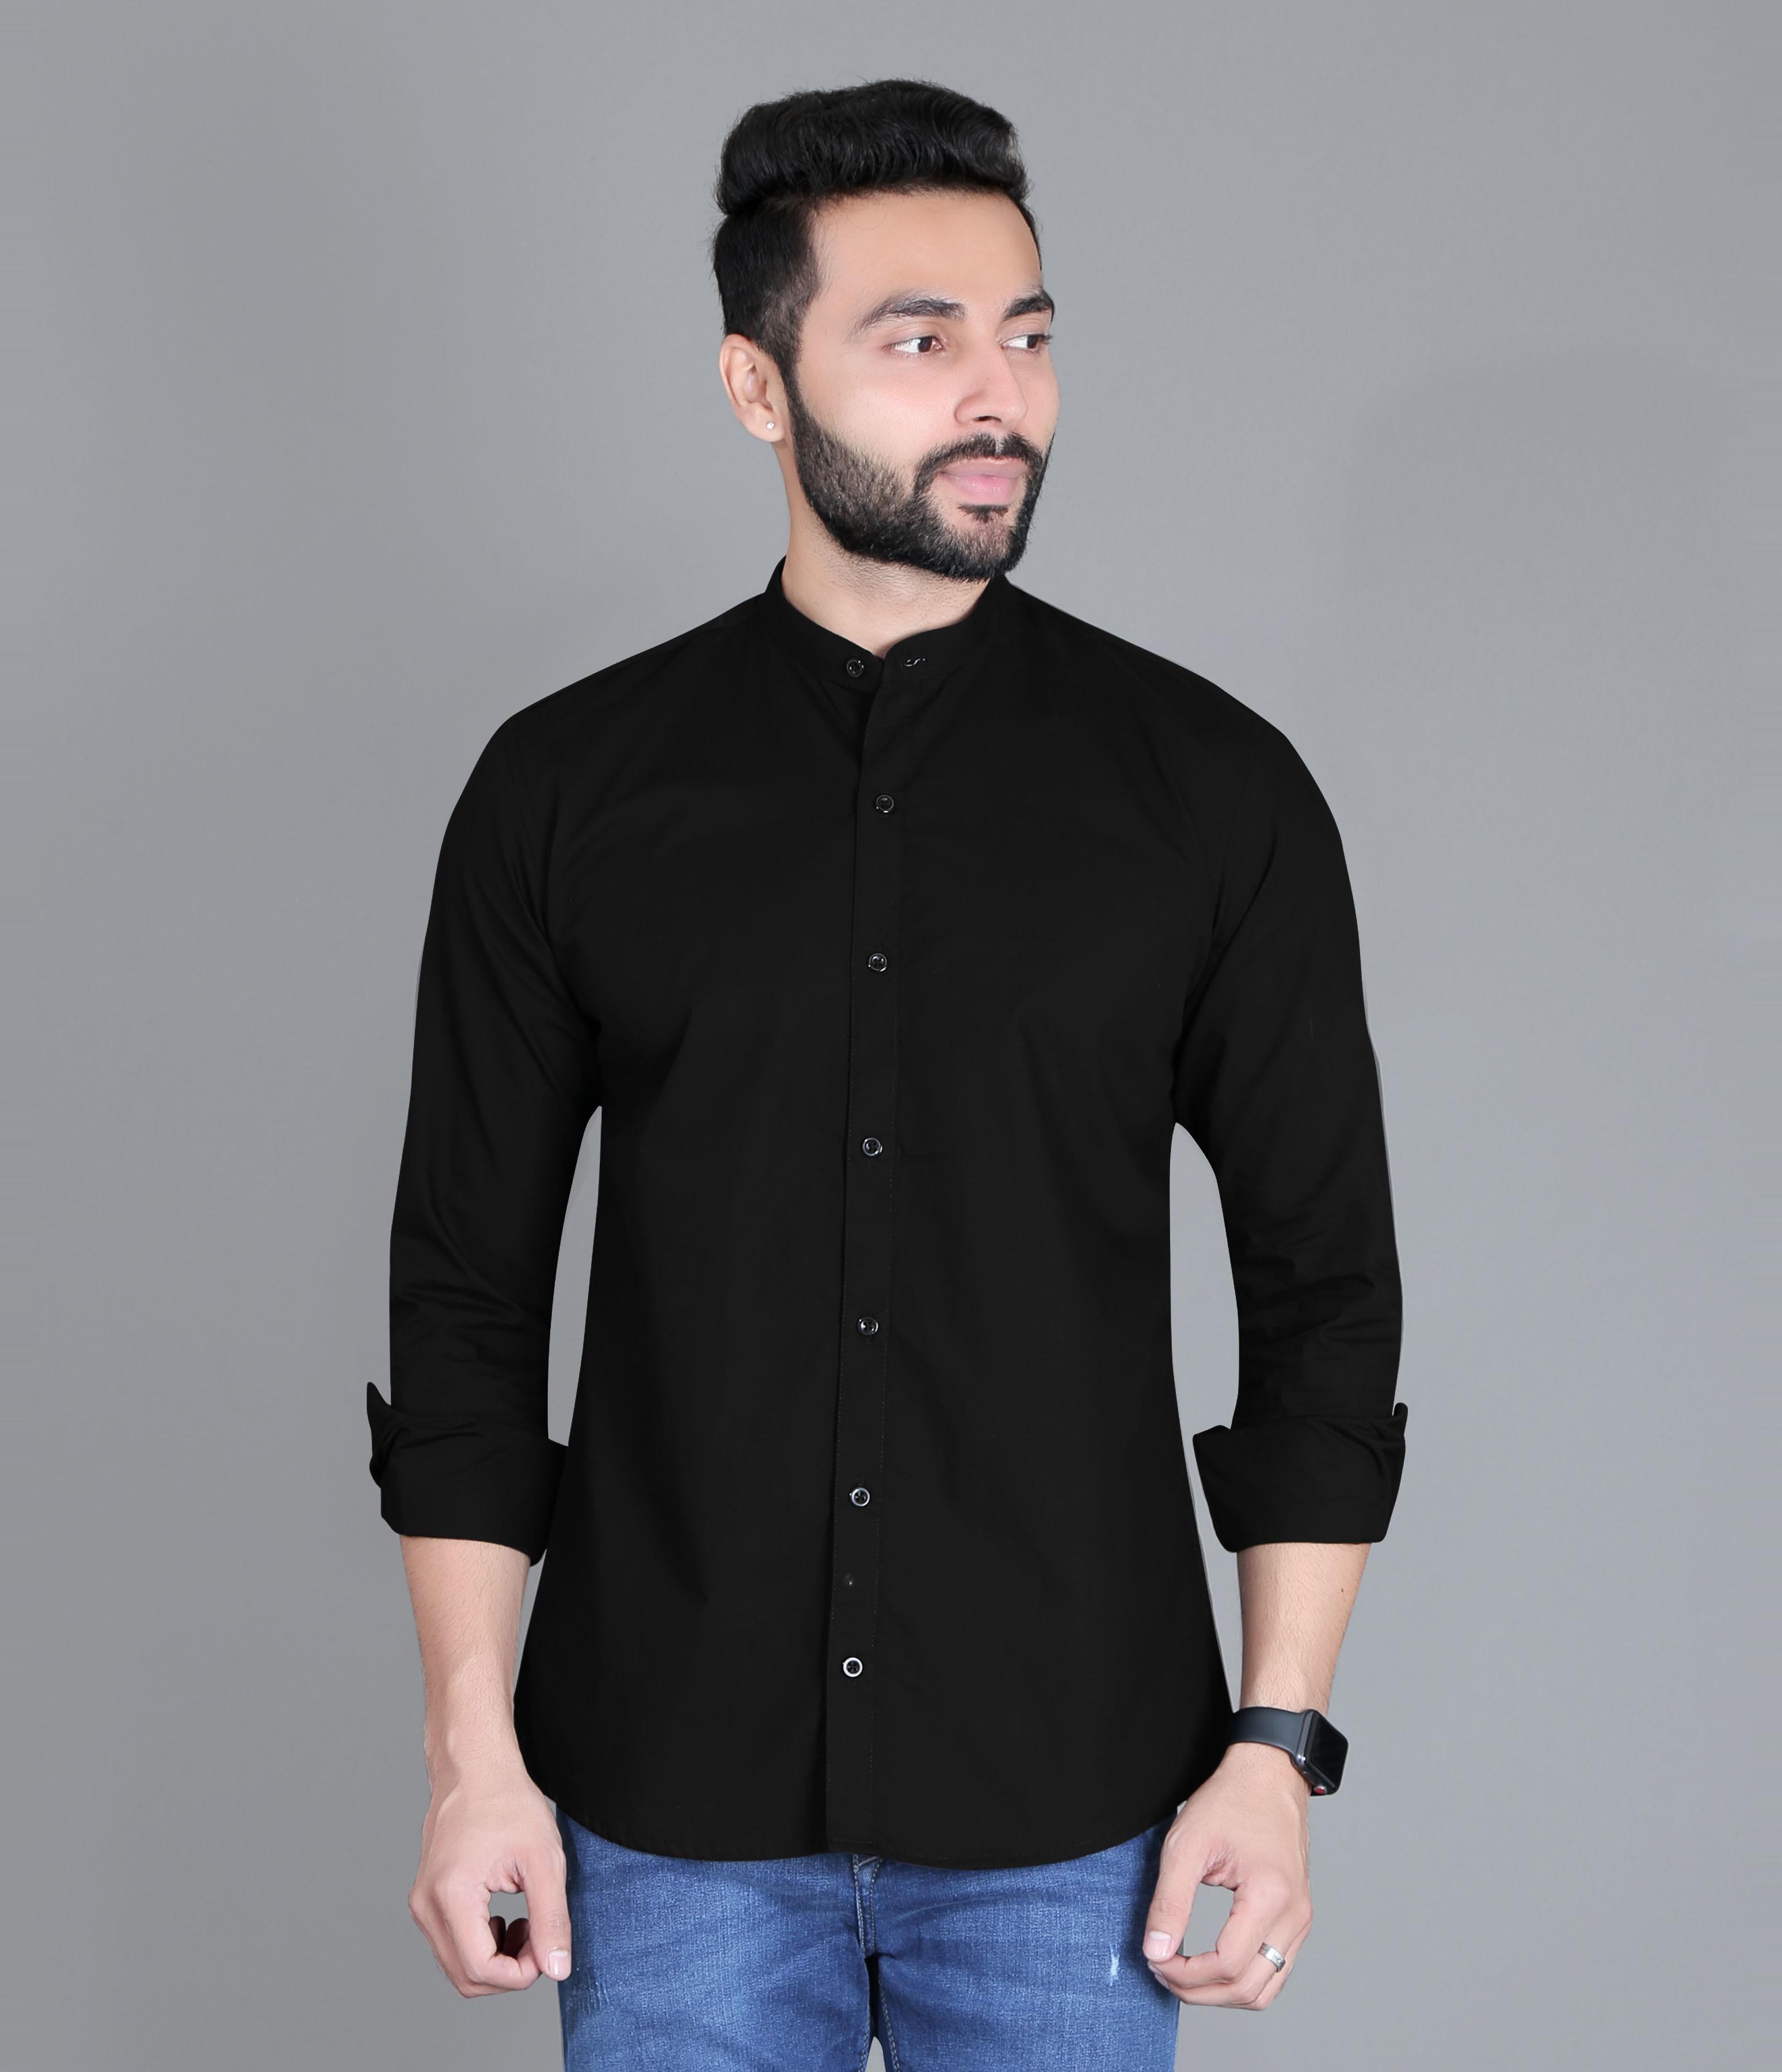 5th Anfold | FIFTH ANFOLD Casual Mandrin Collar full Sleev/Long Sleev Black Pure Cotton Plain Solid Men Shirt